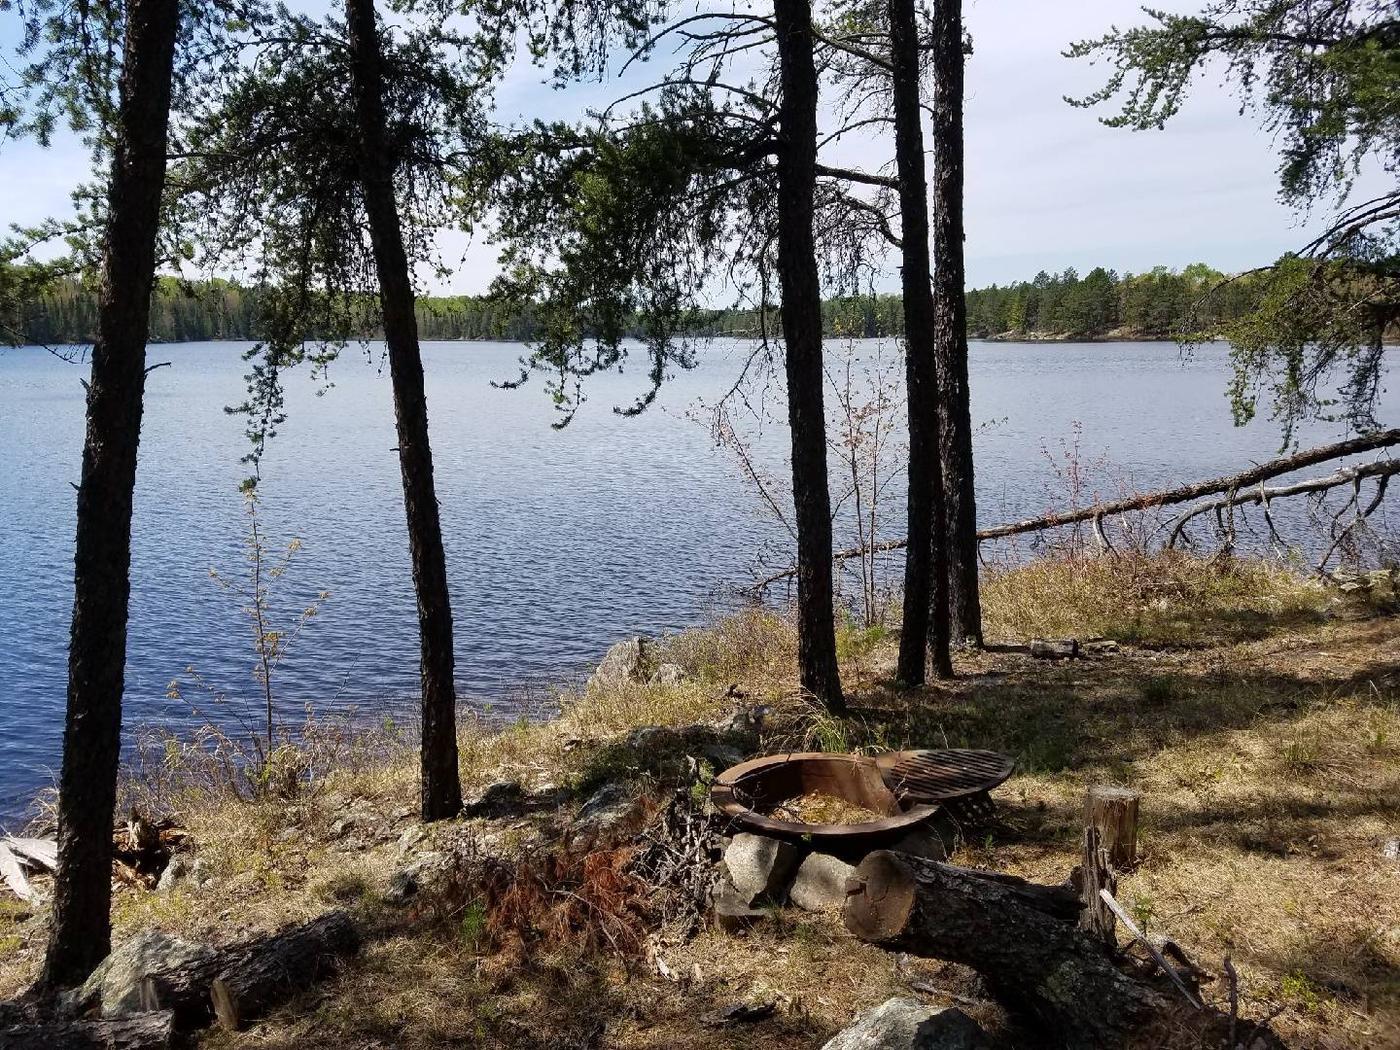 B12 - Olso Lake backcountry campsite